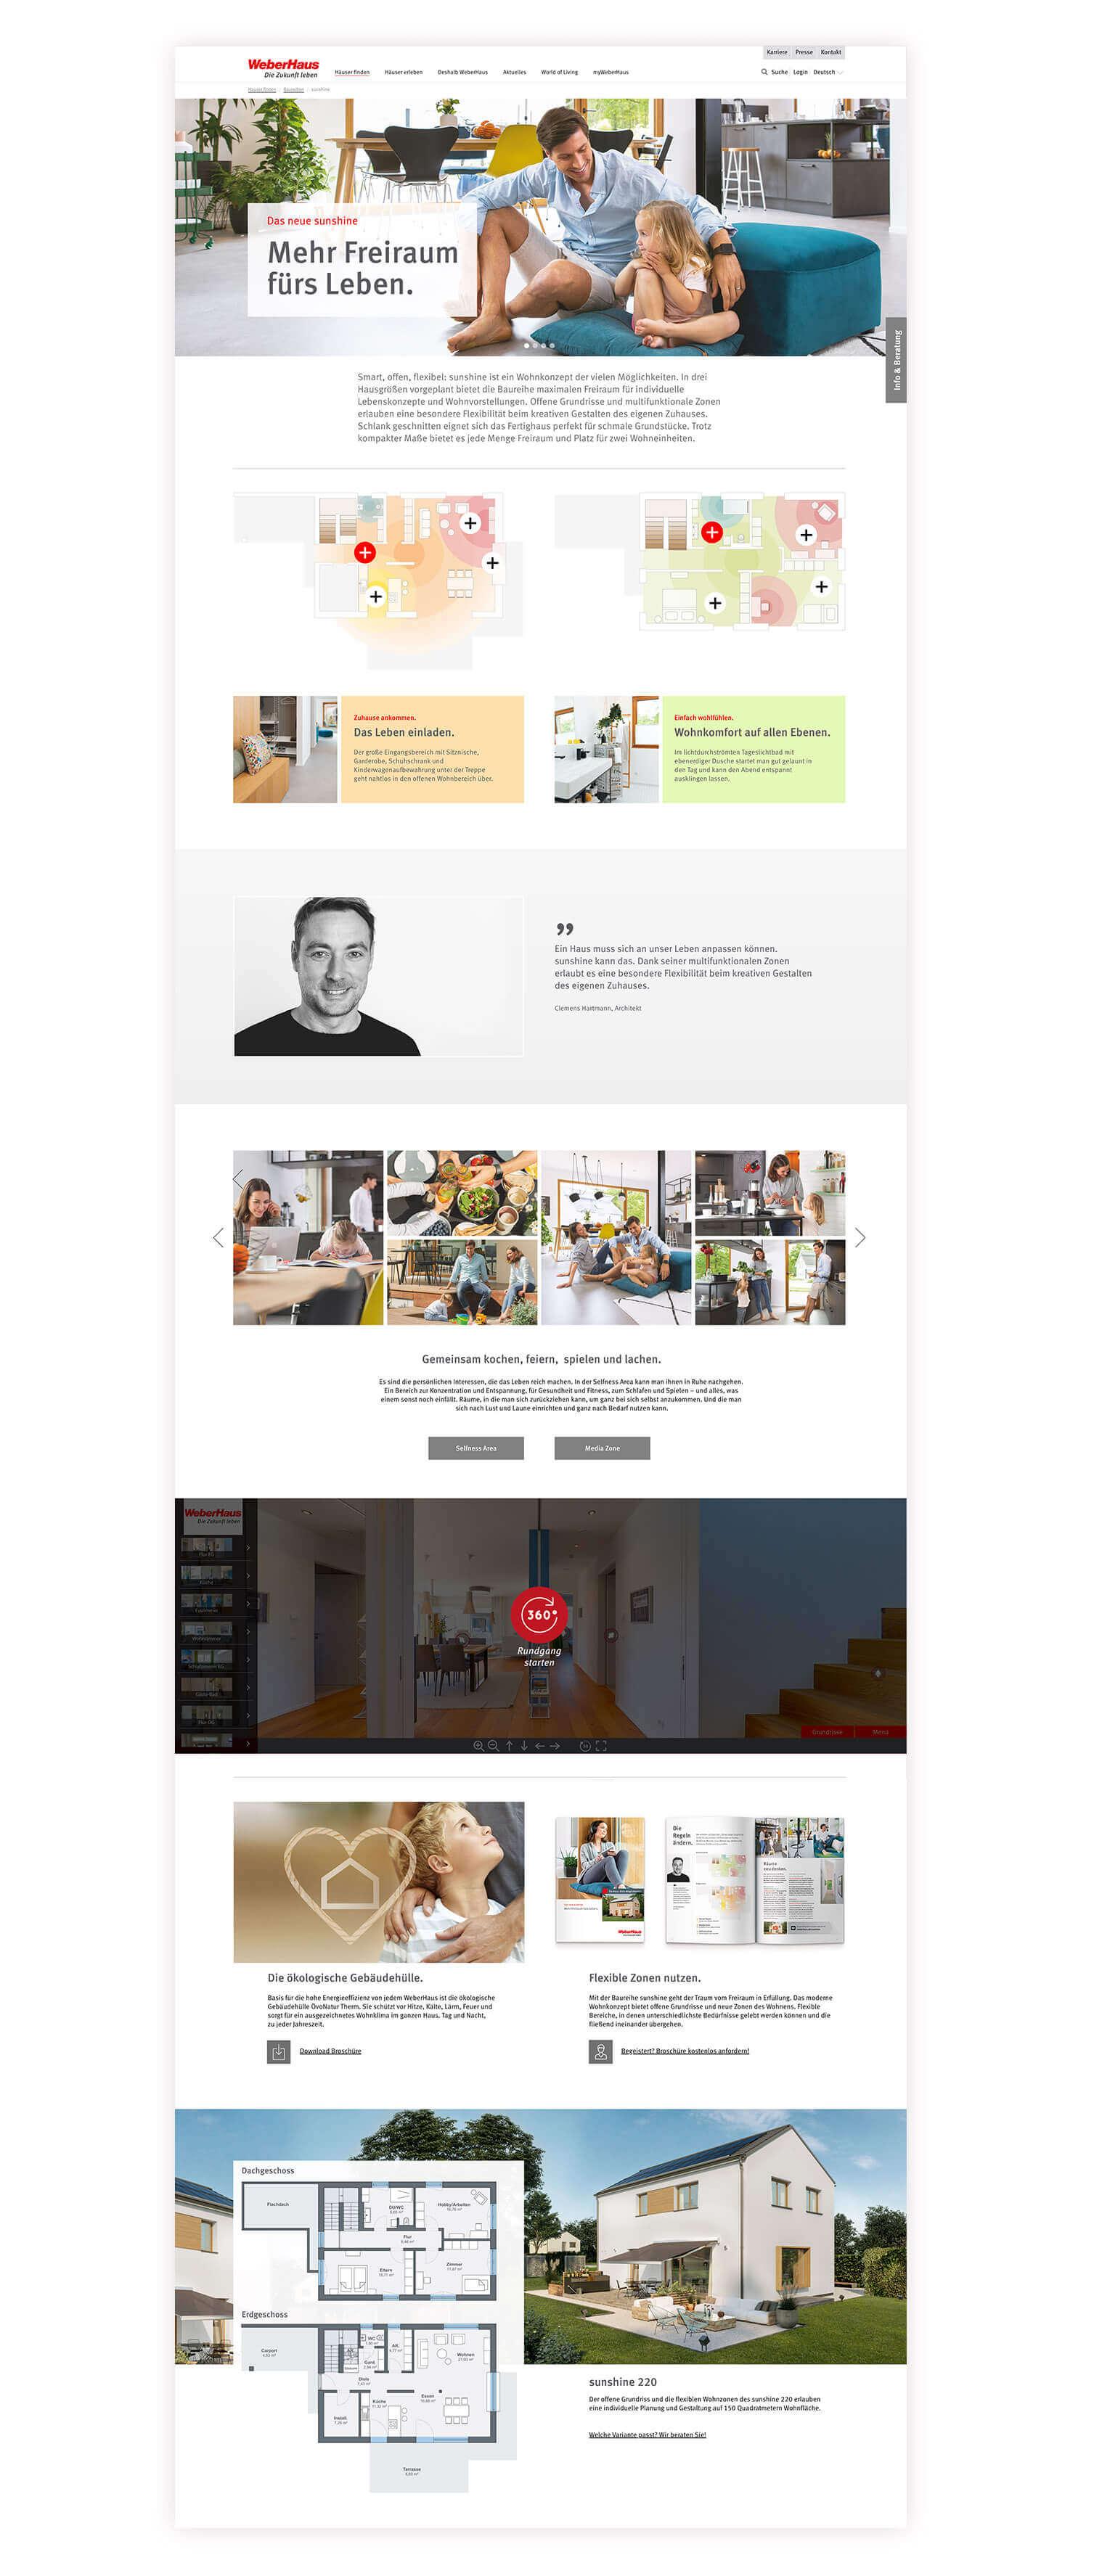 tessmar_brandevolution_weberhaus_sunshine_webseite